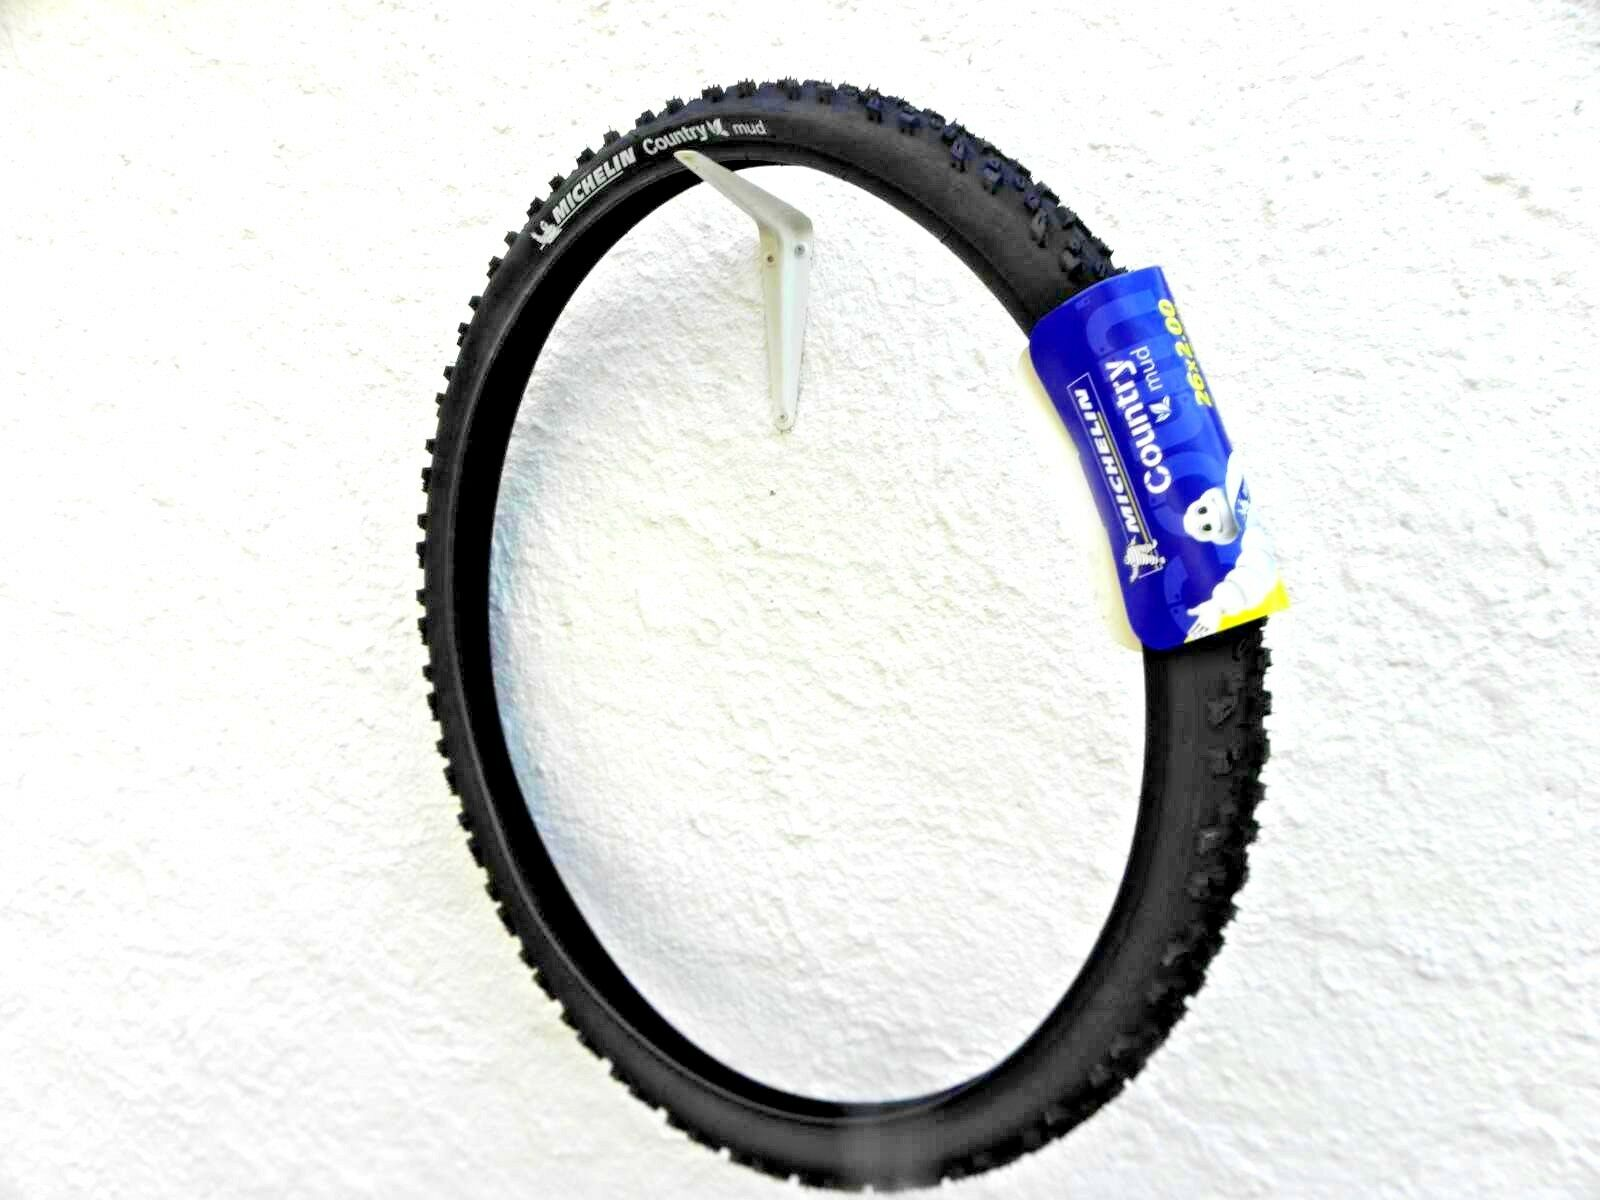 Fahrradreifen Fahrradreifen Fahrradreifen Michelin MTB- REIFEN COUNTRY Mud 26X2.00-Decke Varianten   04278 6e9dc9